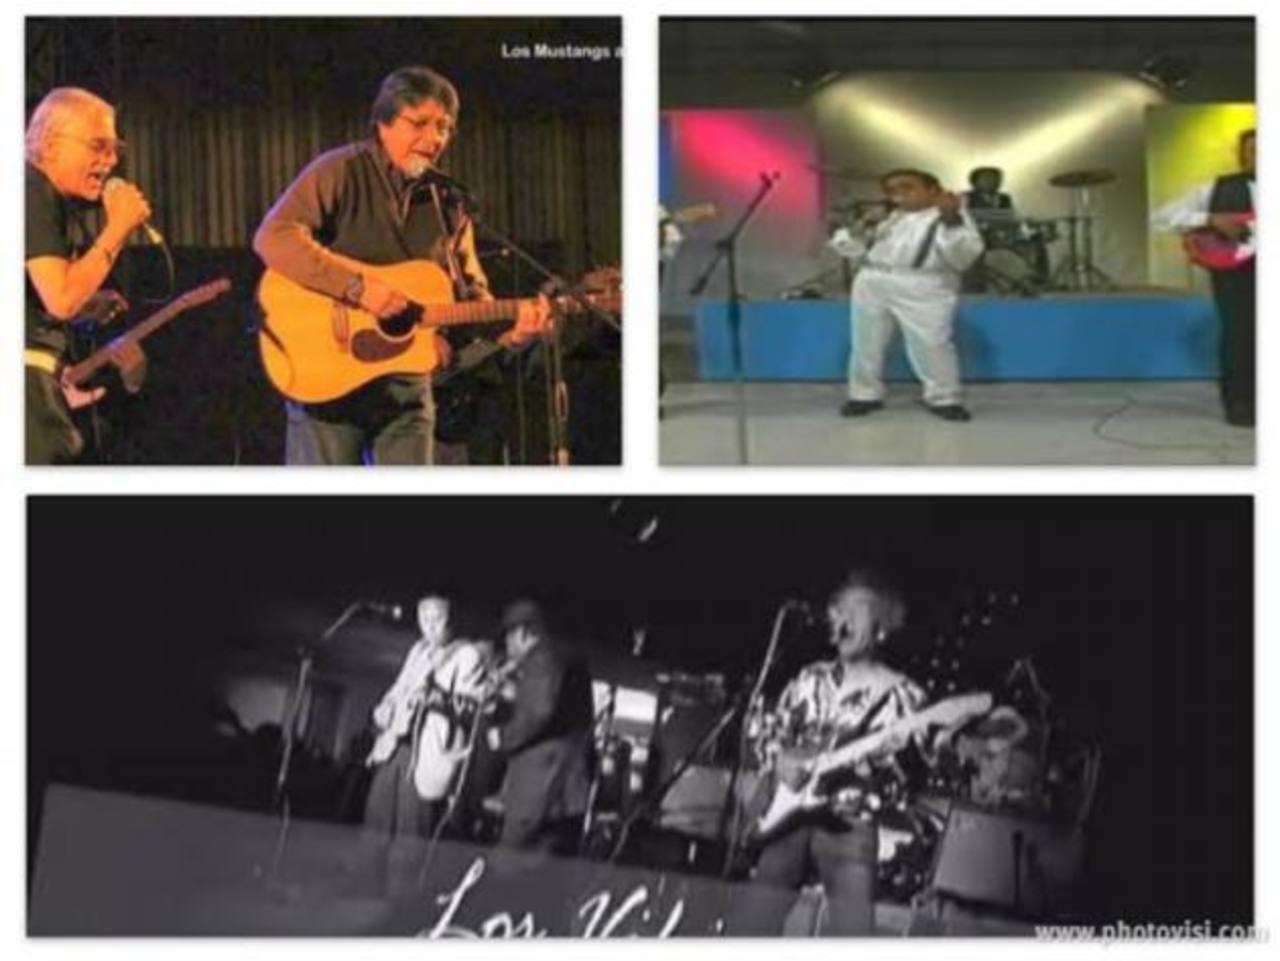 20 grupos de la época dorada de la música salvadoreña